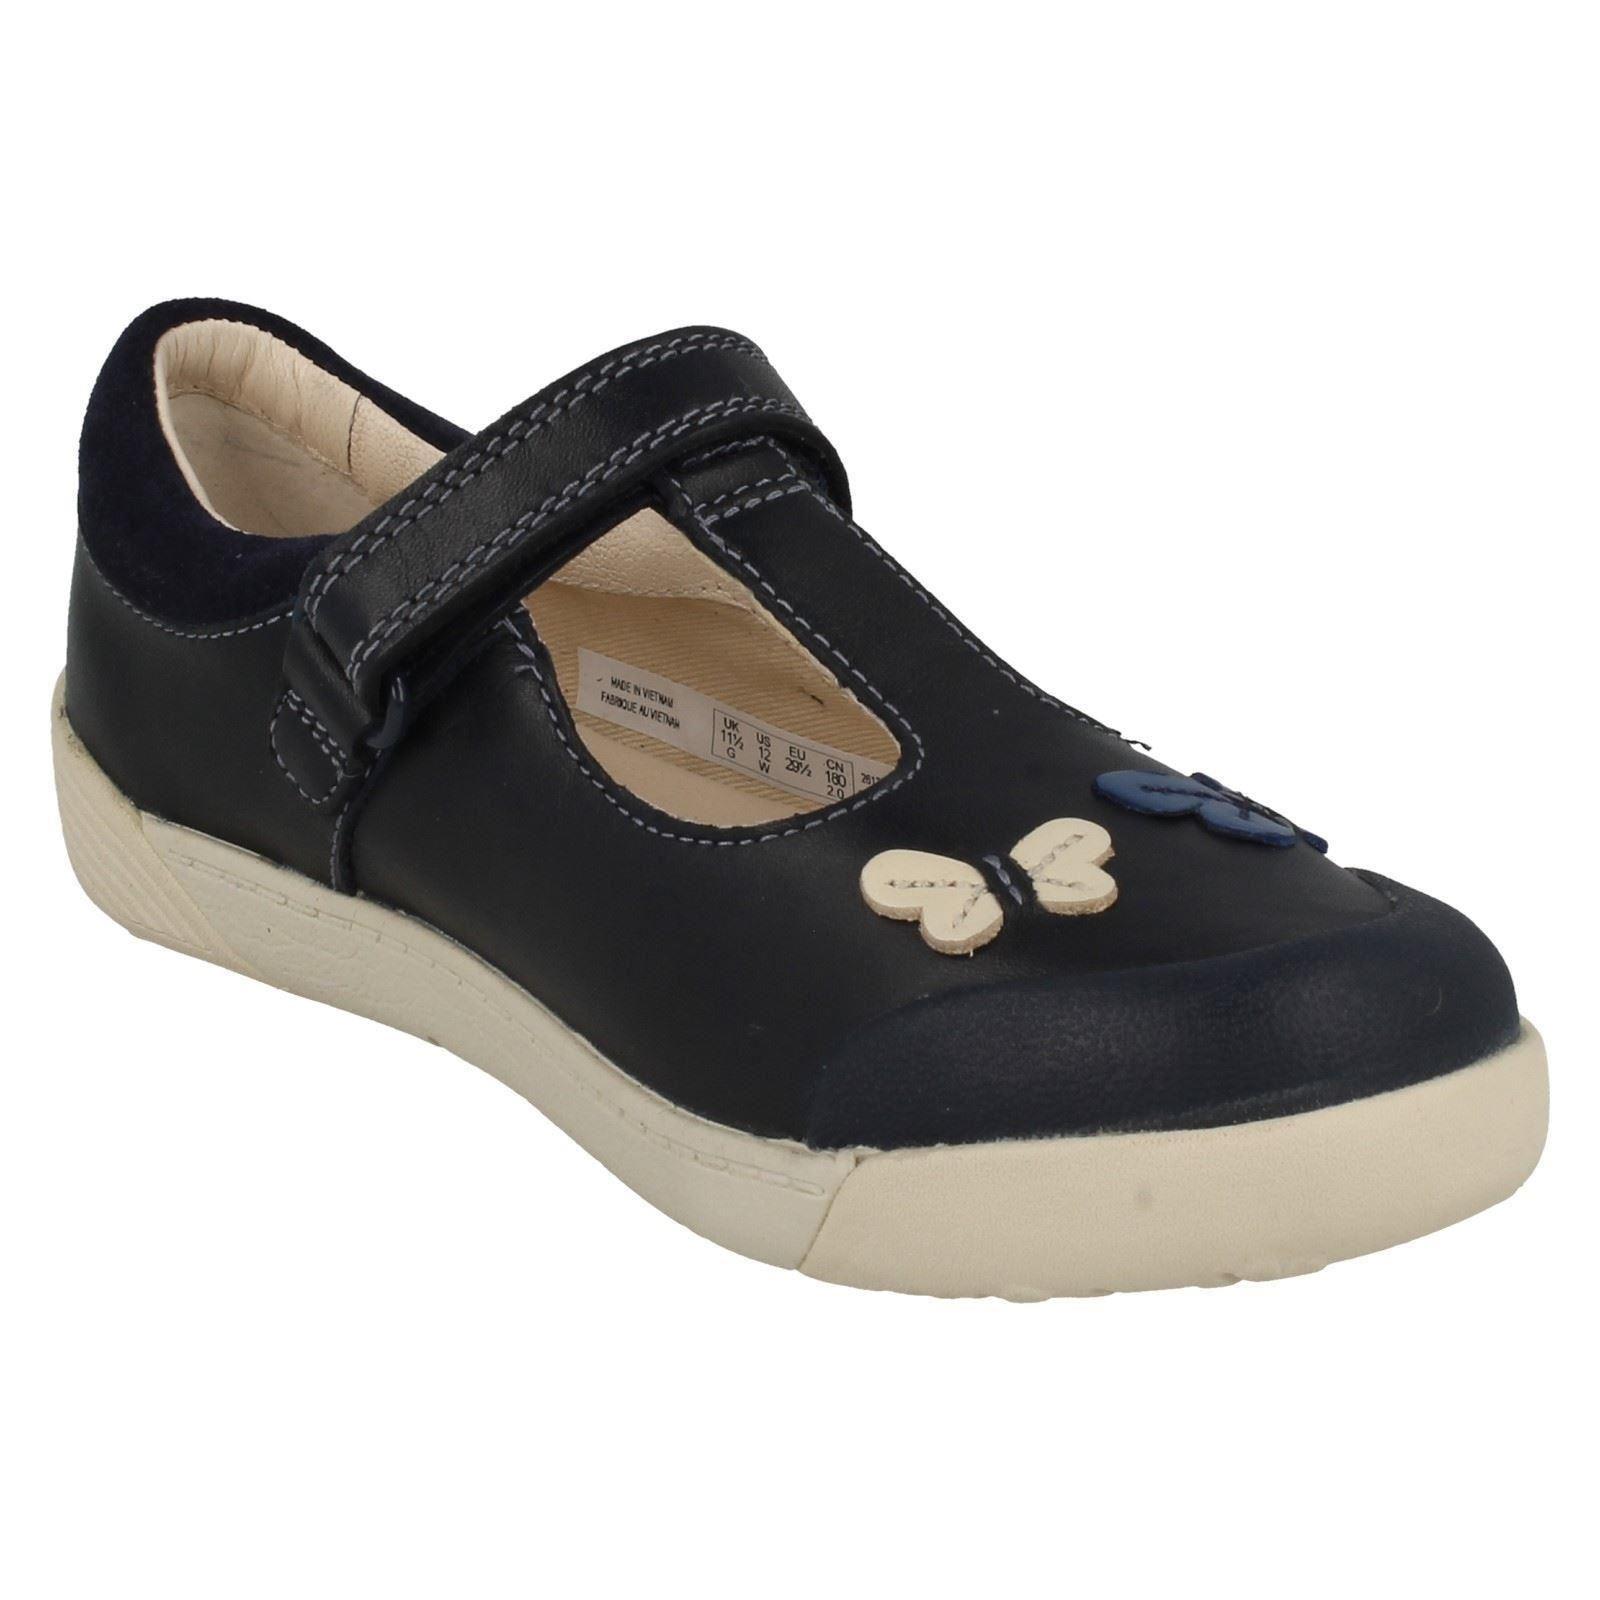 para T azul azul marino bar Folk Clarks Zapatos niñas Flo Lil w47qYx6I